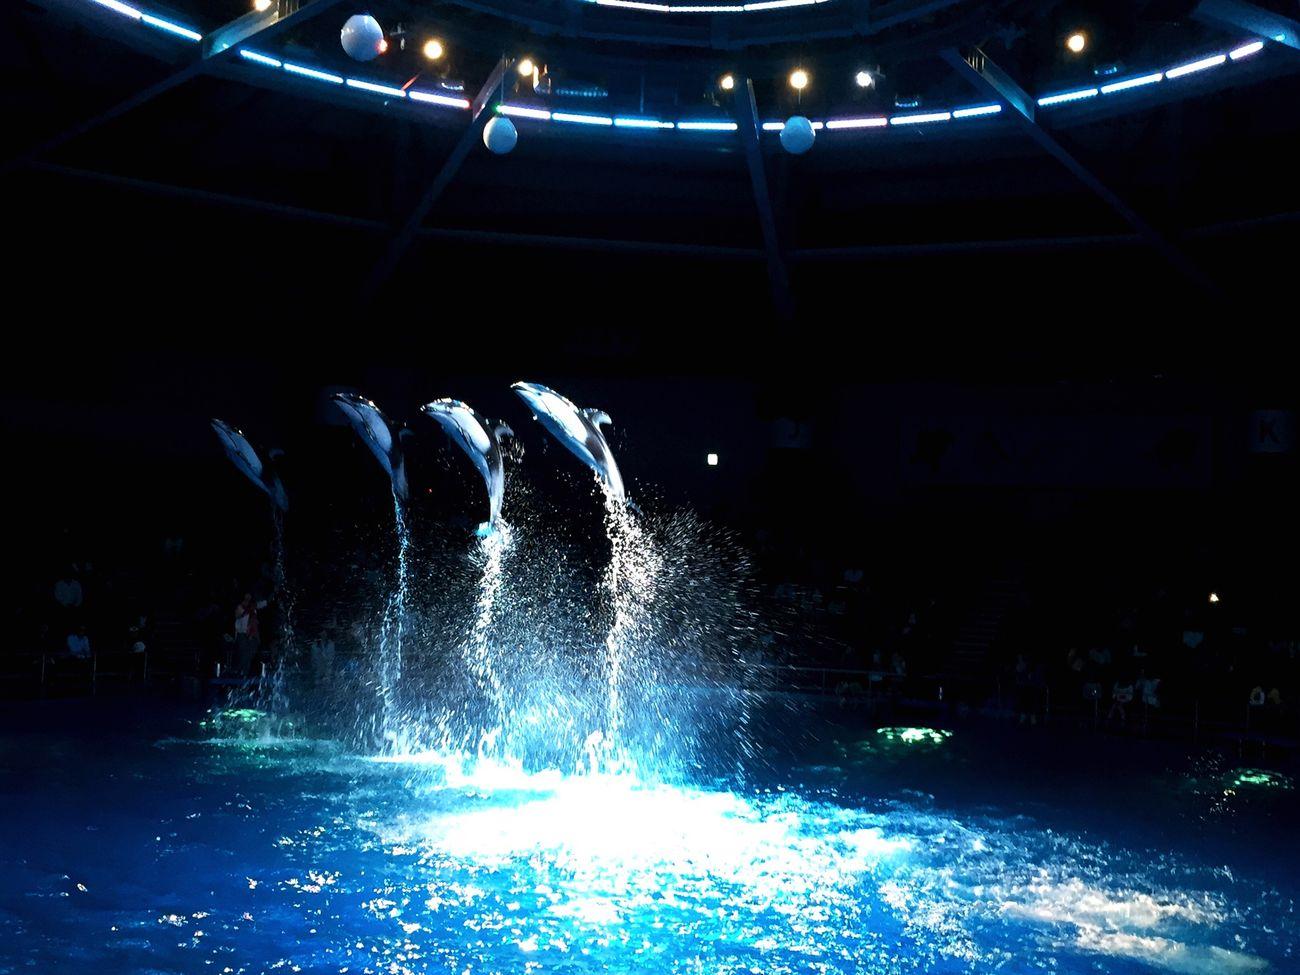 Aquarium Dolphin Japan Tokyo Shinagawa Aquarium 品川